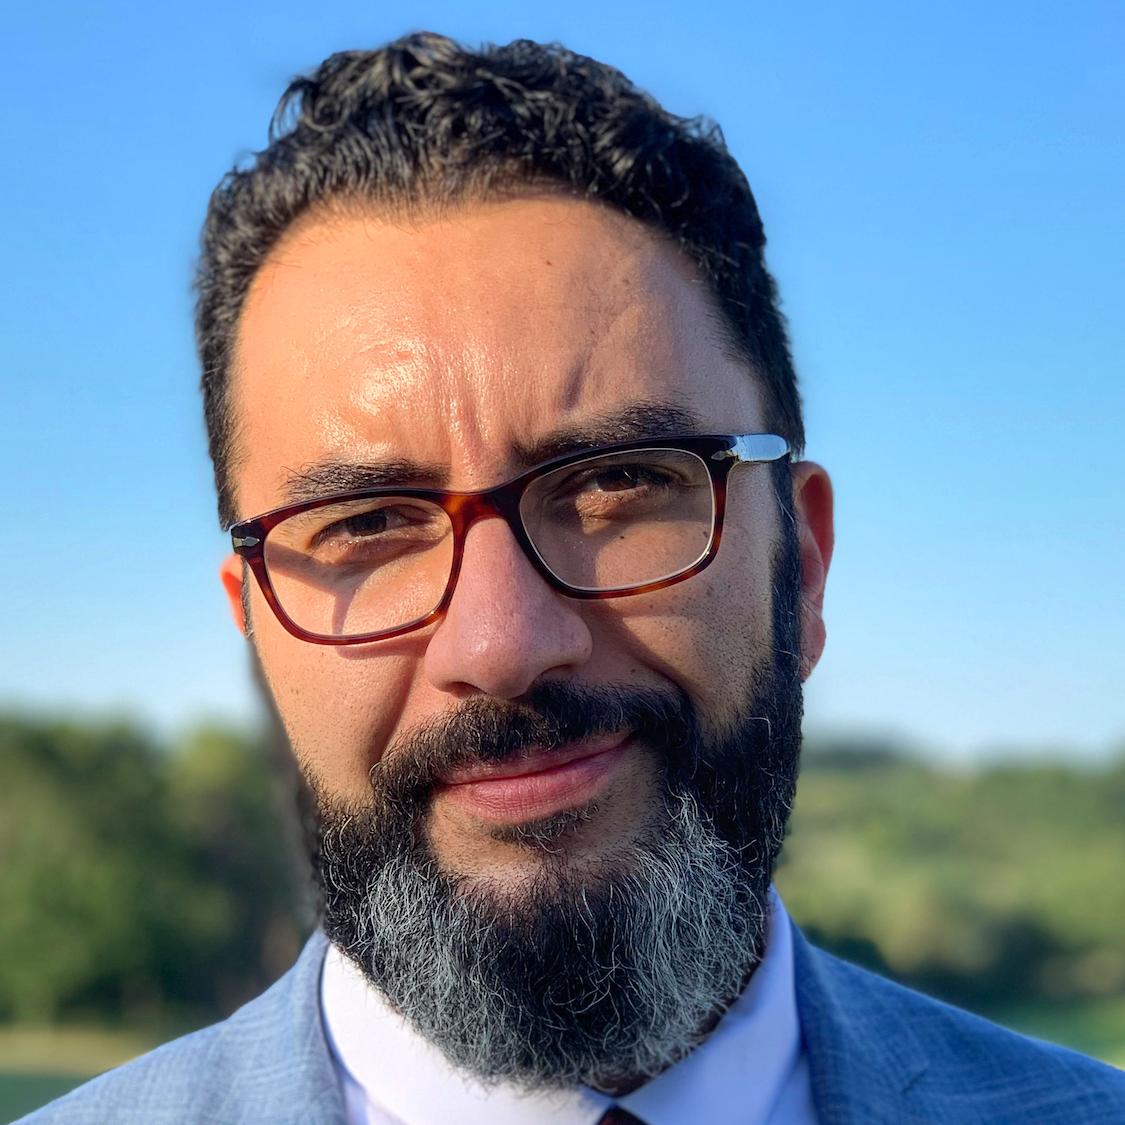 Yannick Meneceur | Digital Policy Advisor, Council of Europe (contributor)